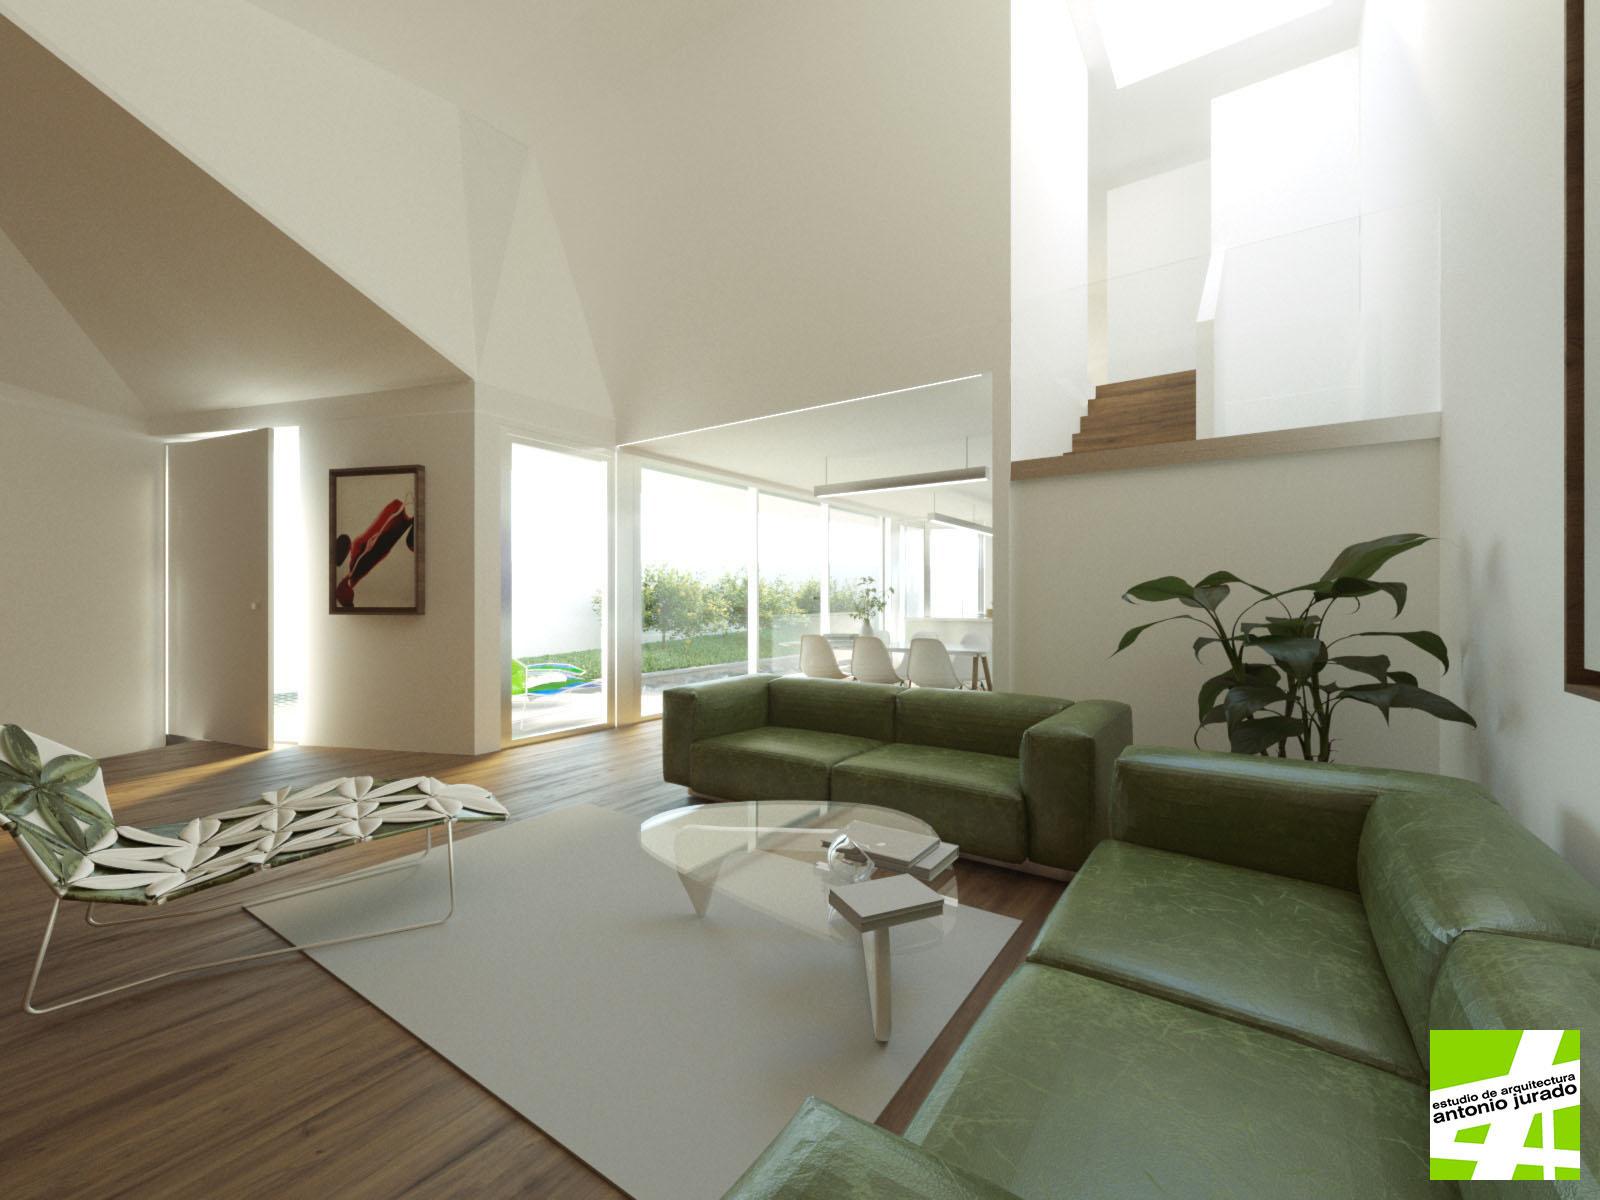 casa-ob-house-alhaurin-malaga-arquitecto-antonio-jurado-07